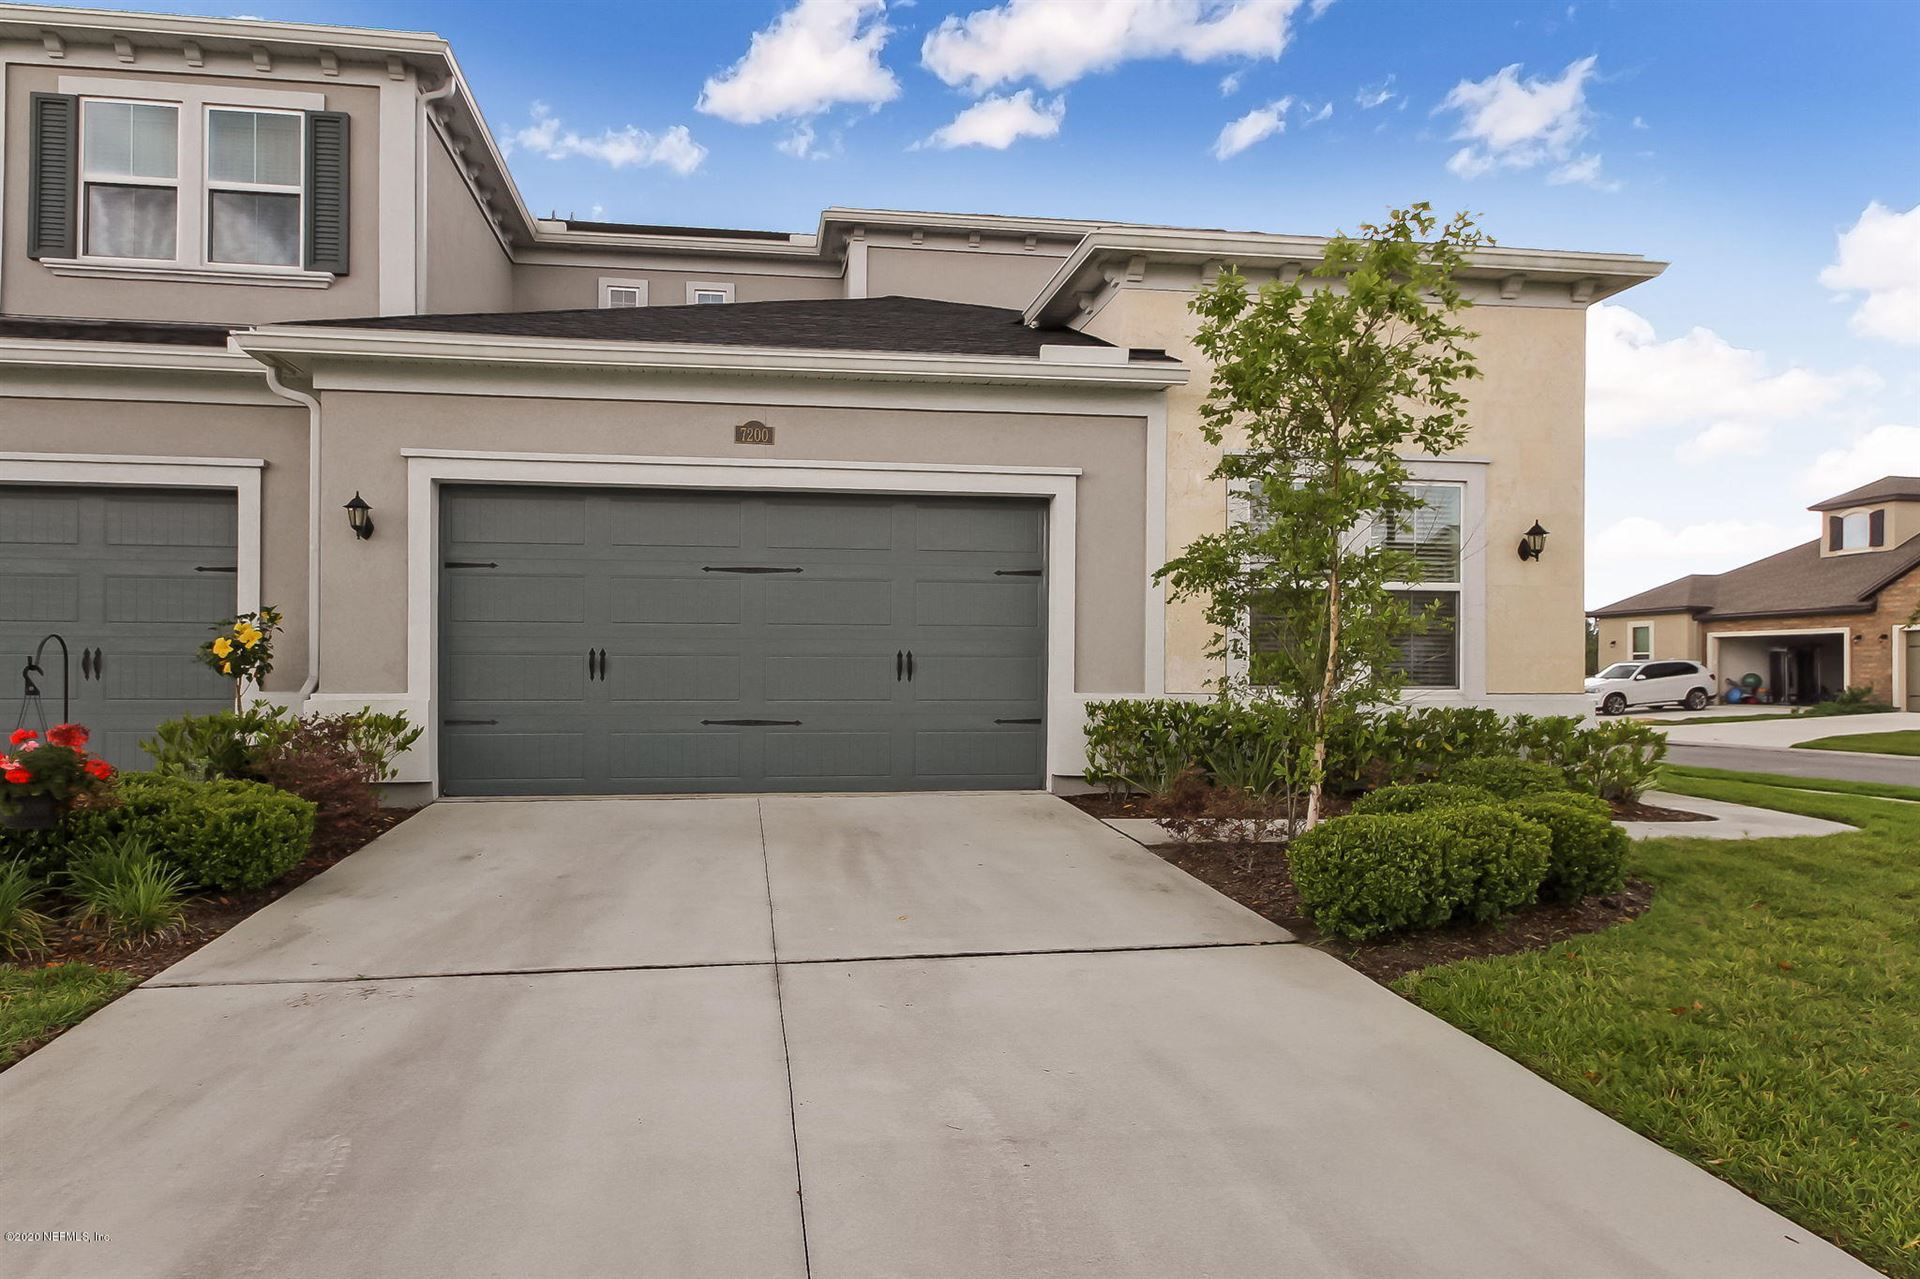 7200 MONDOVI LN, Jacksonville, FL 32258 - MLS#: 1061516